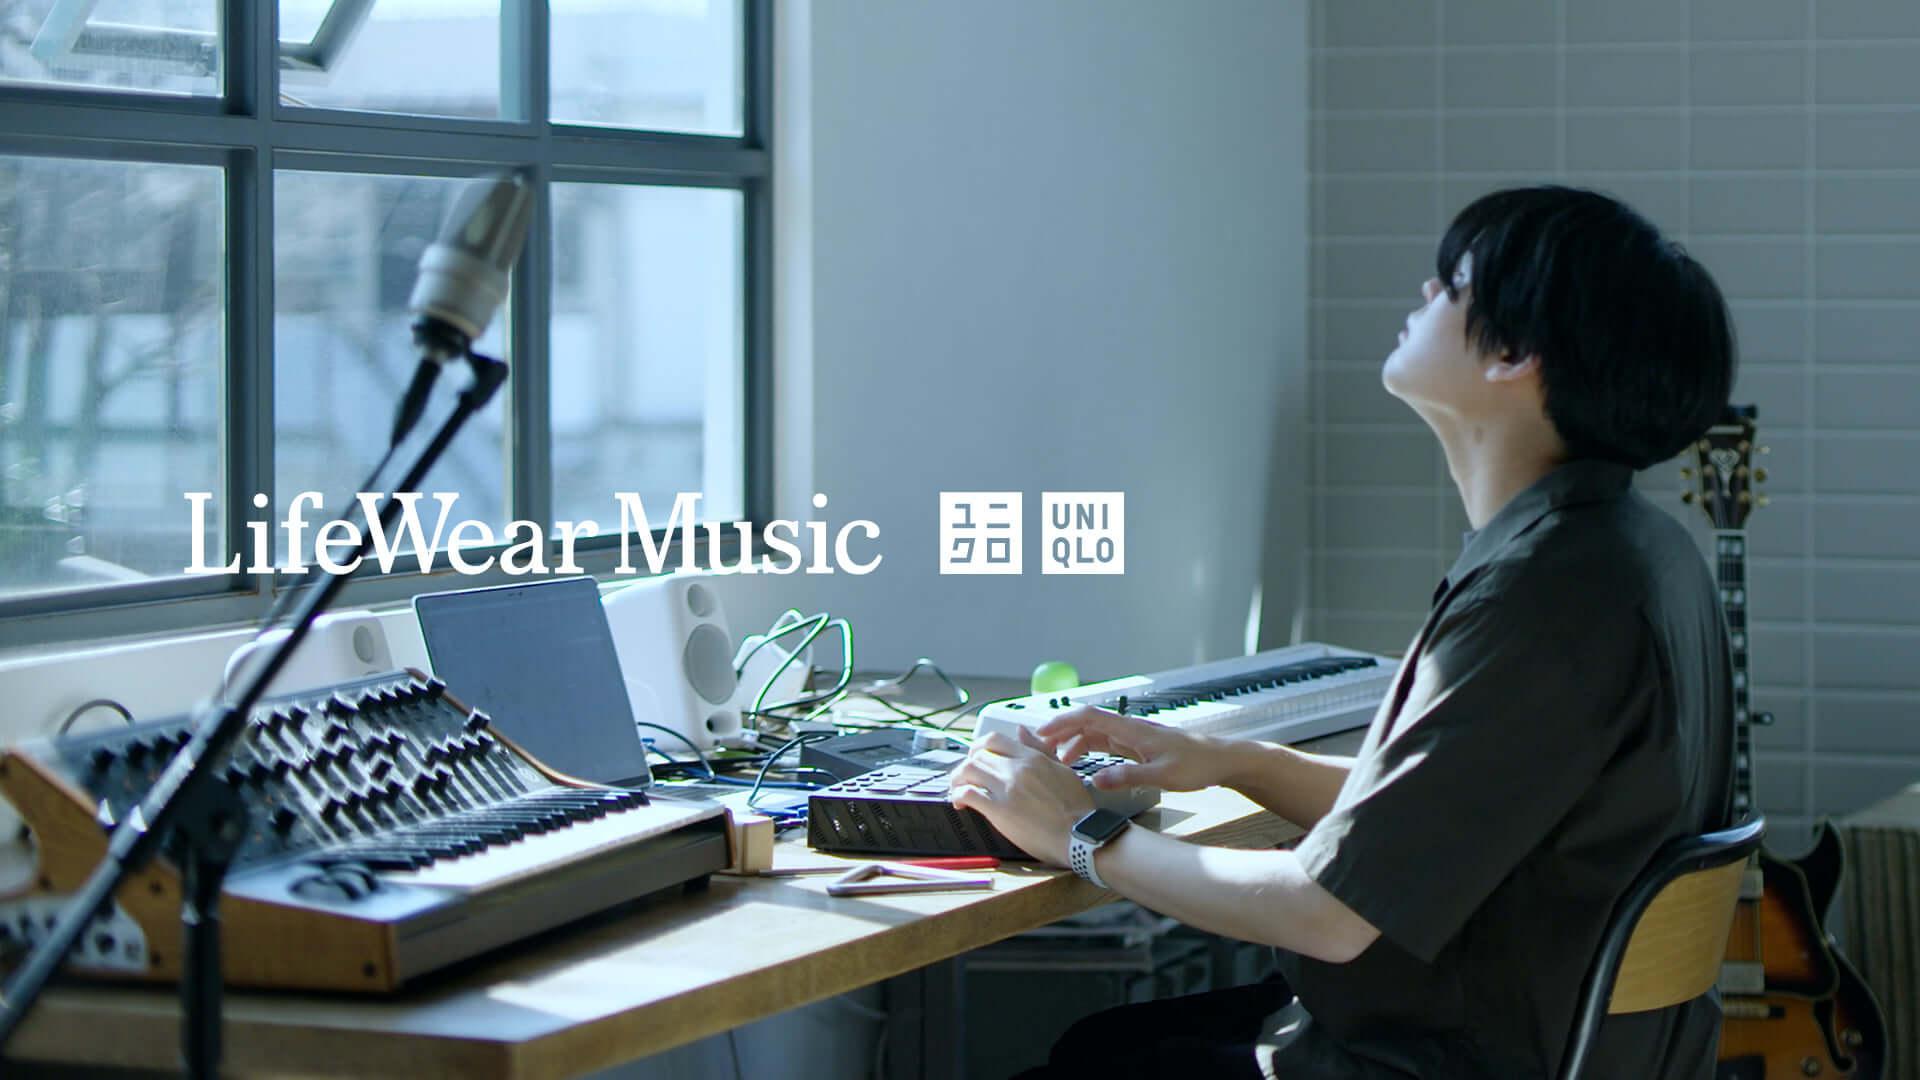 STUTSがユニクロのプロジェクト「LifeWear Music」に出演!作業用BGMを全9曲書き下ろし music210329_stuts_1-1920x1080